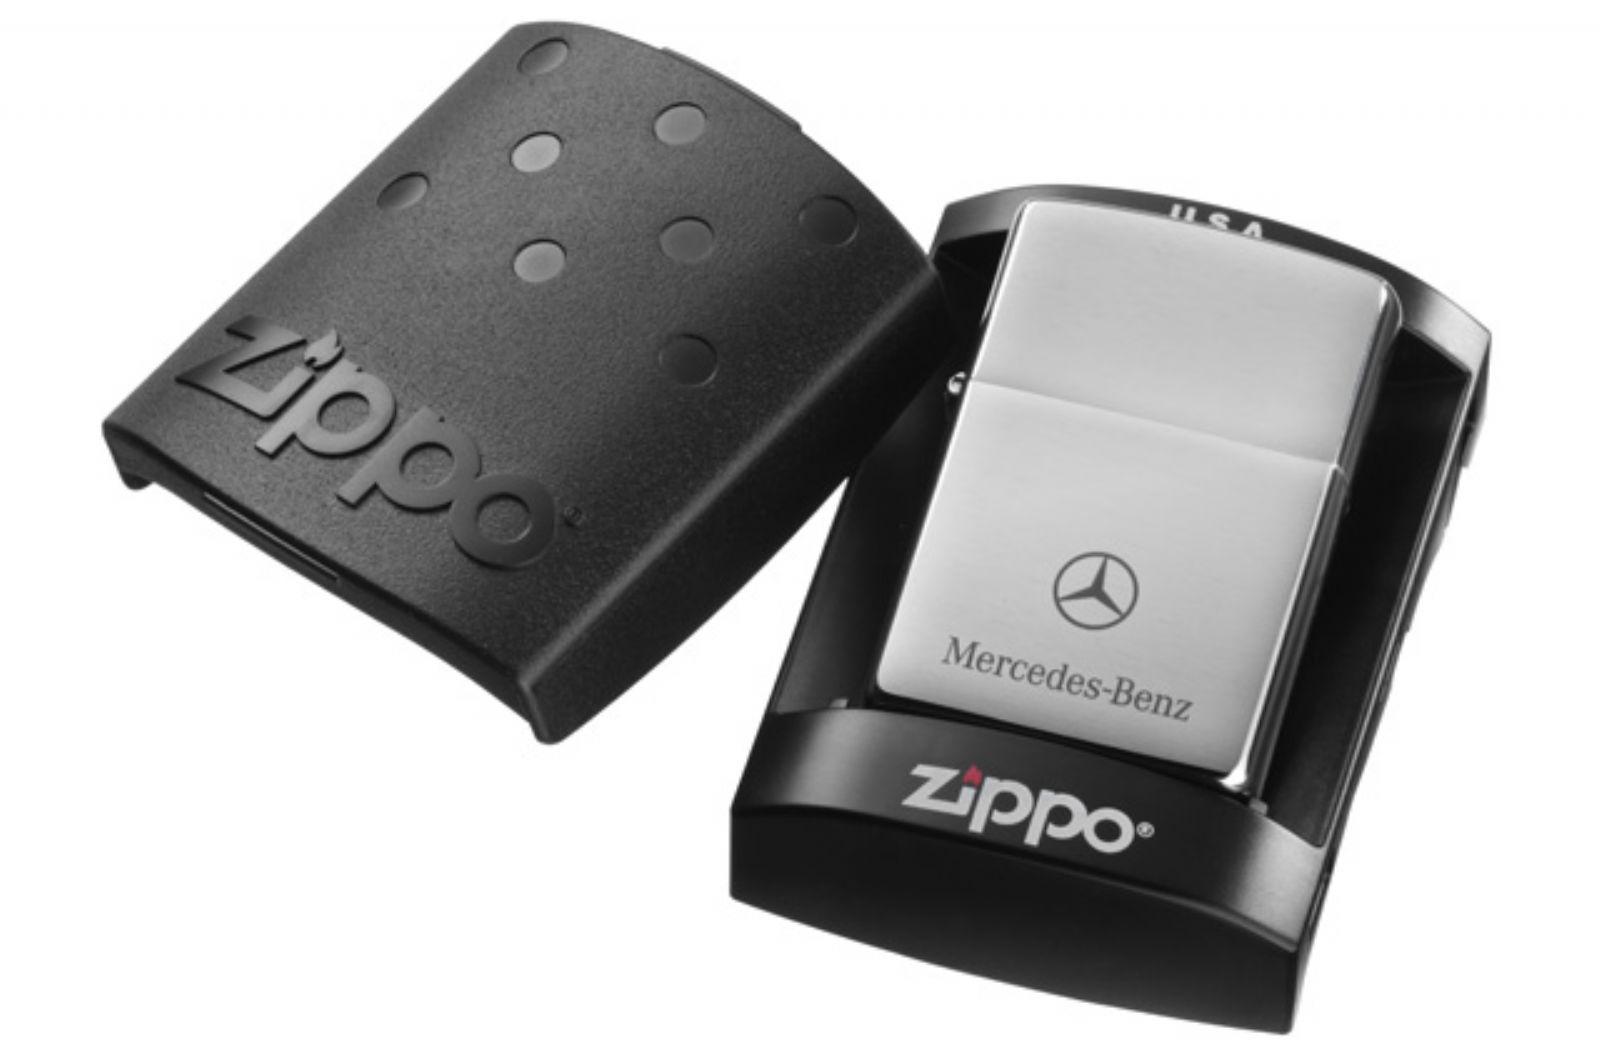 Mercedes benz parts accessories e shop e auto shops for Mercedes benz e350 parts accessories